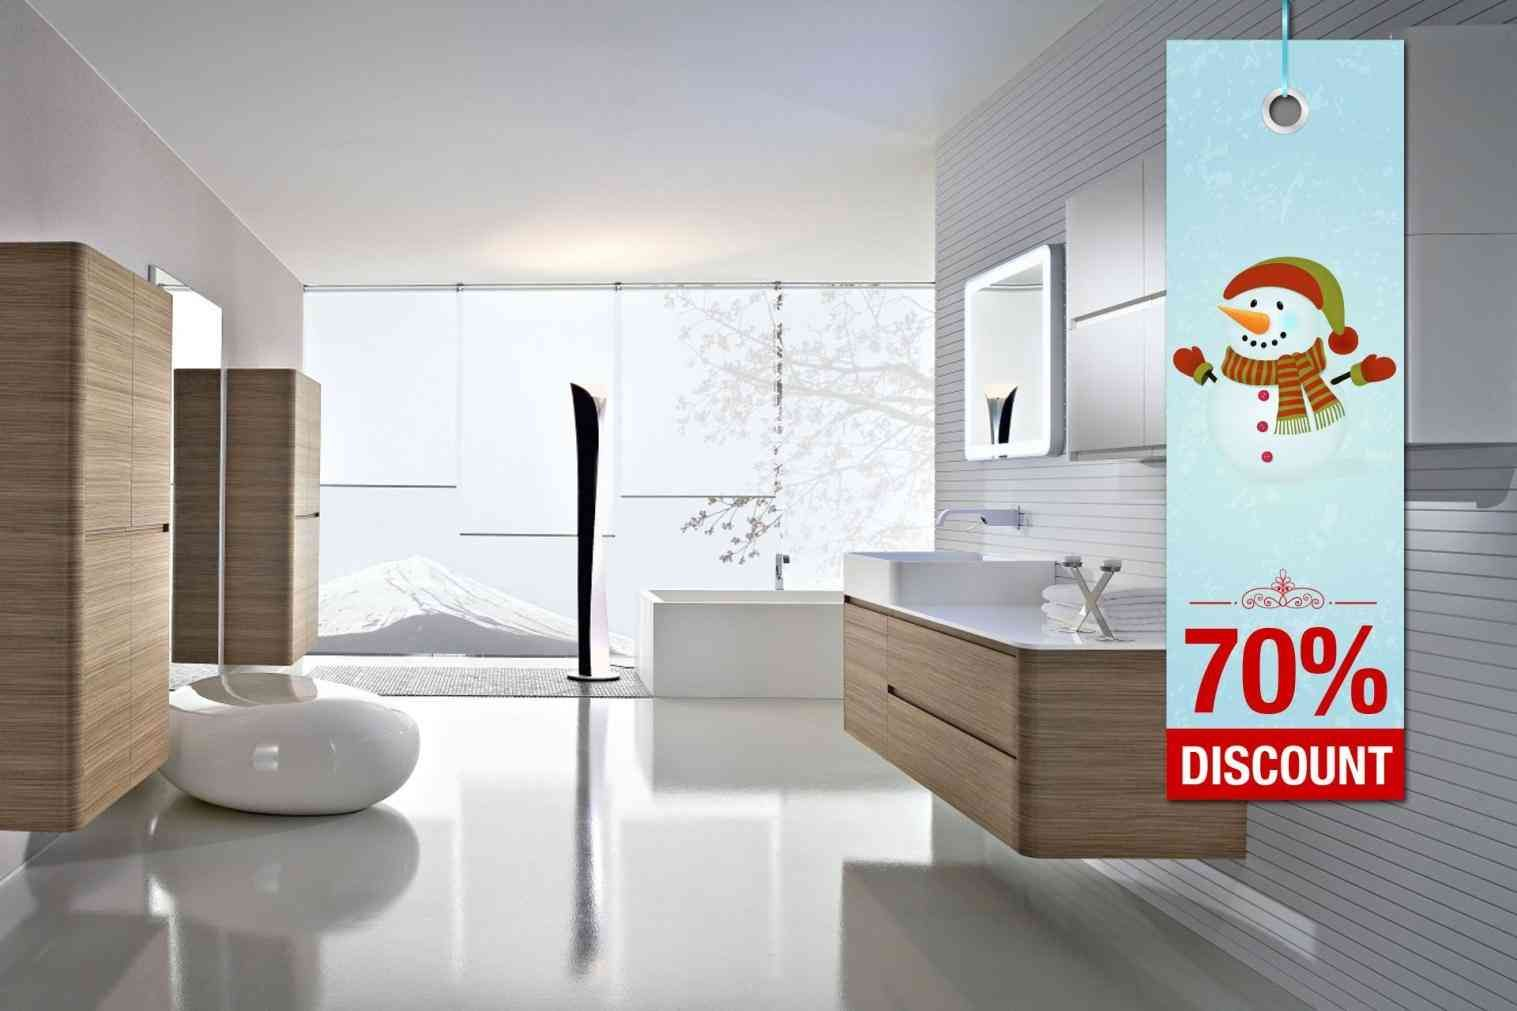 New Post bathrooms showrooms | Bathroom_Ideas | Pinterest | Bathroom ...